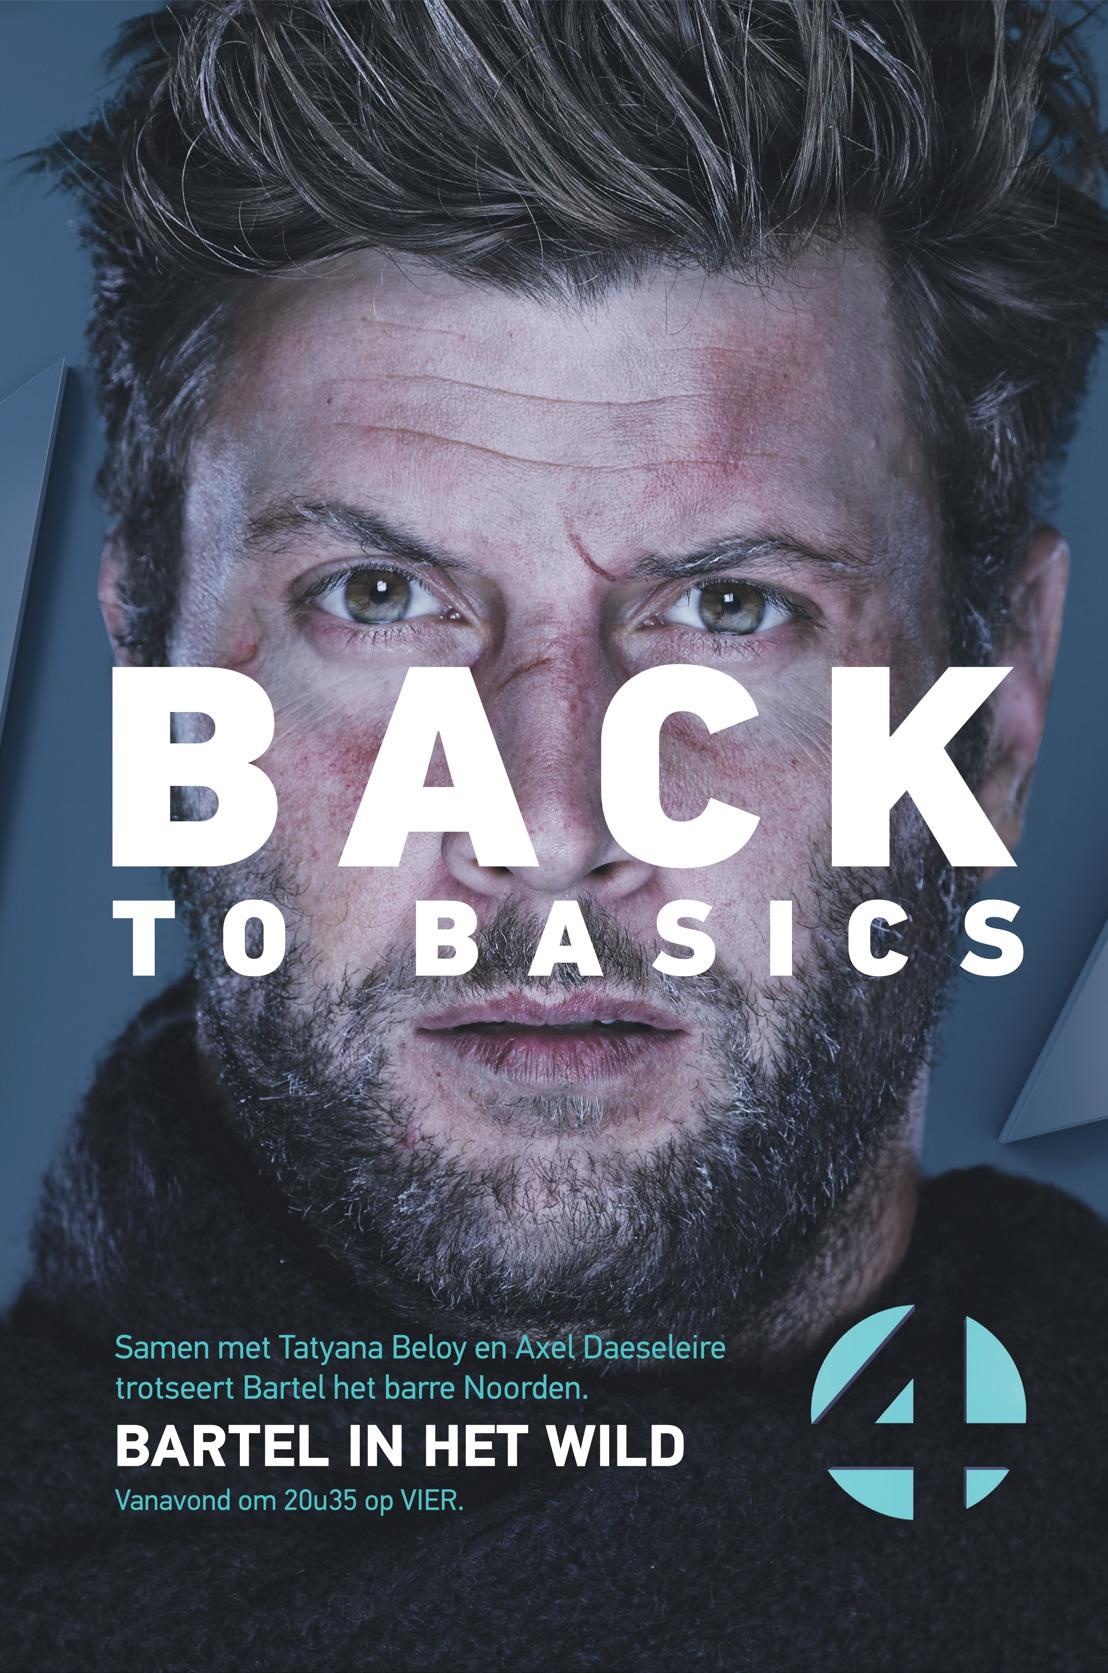 Bartel in het Wild. Back to basics met Tatyana Beloy en Axel Daeseleire.